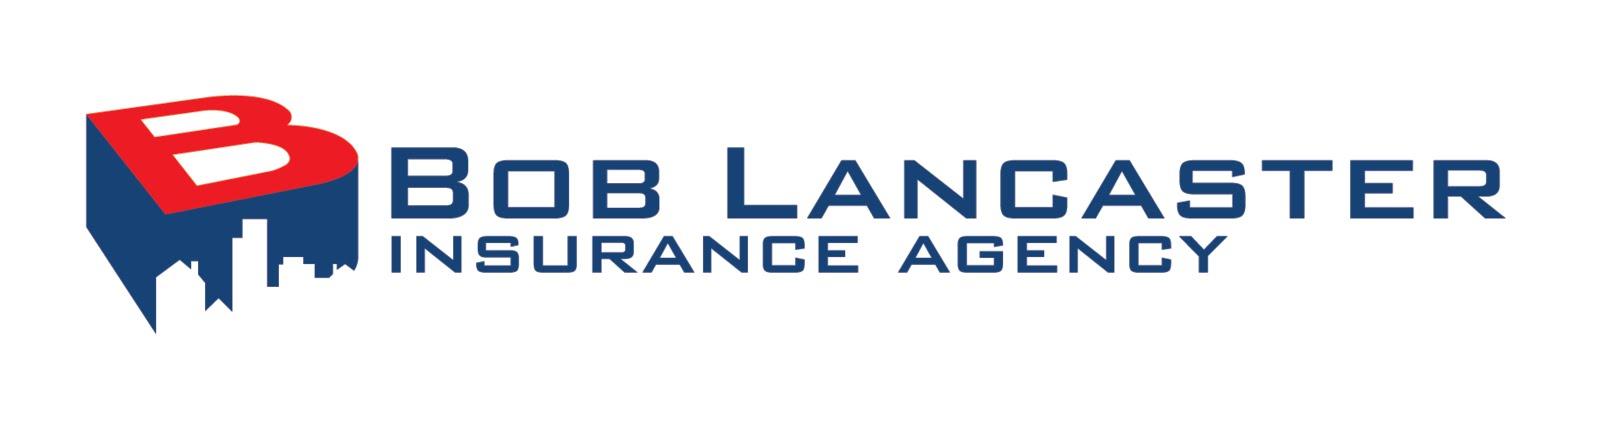 Bob Blogs Insurance